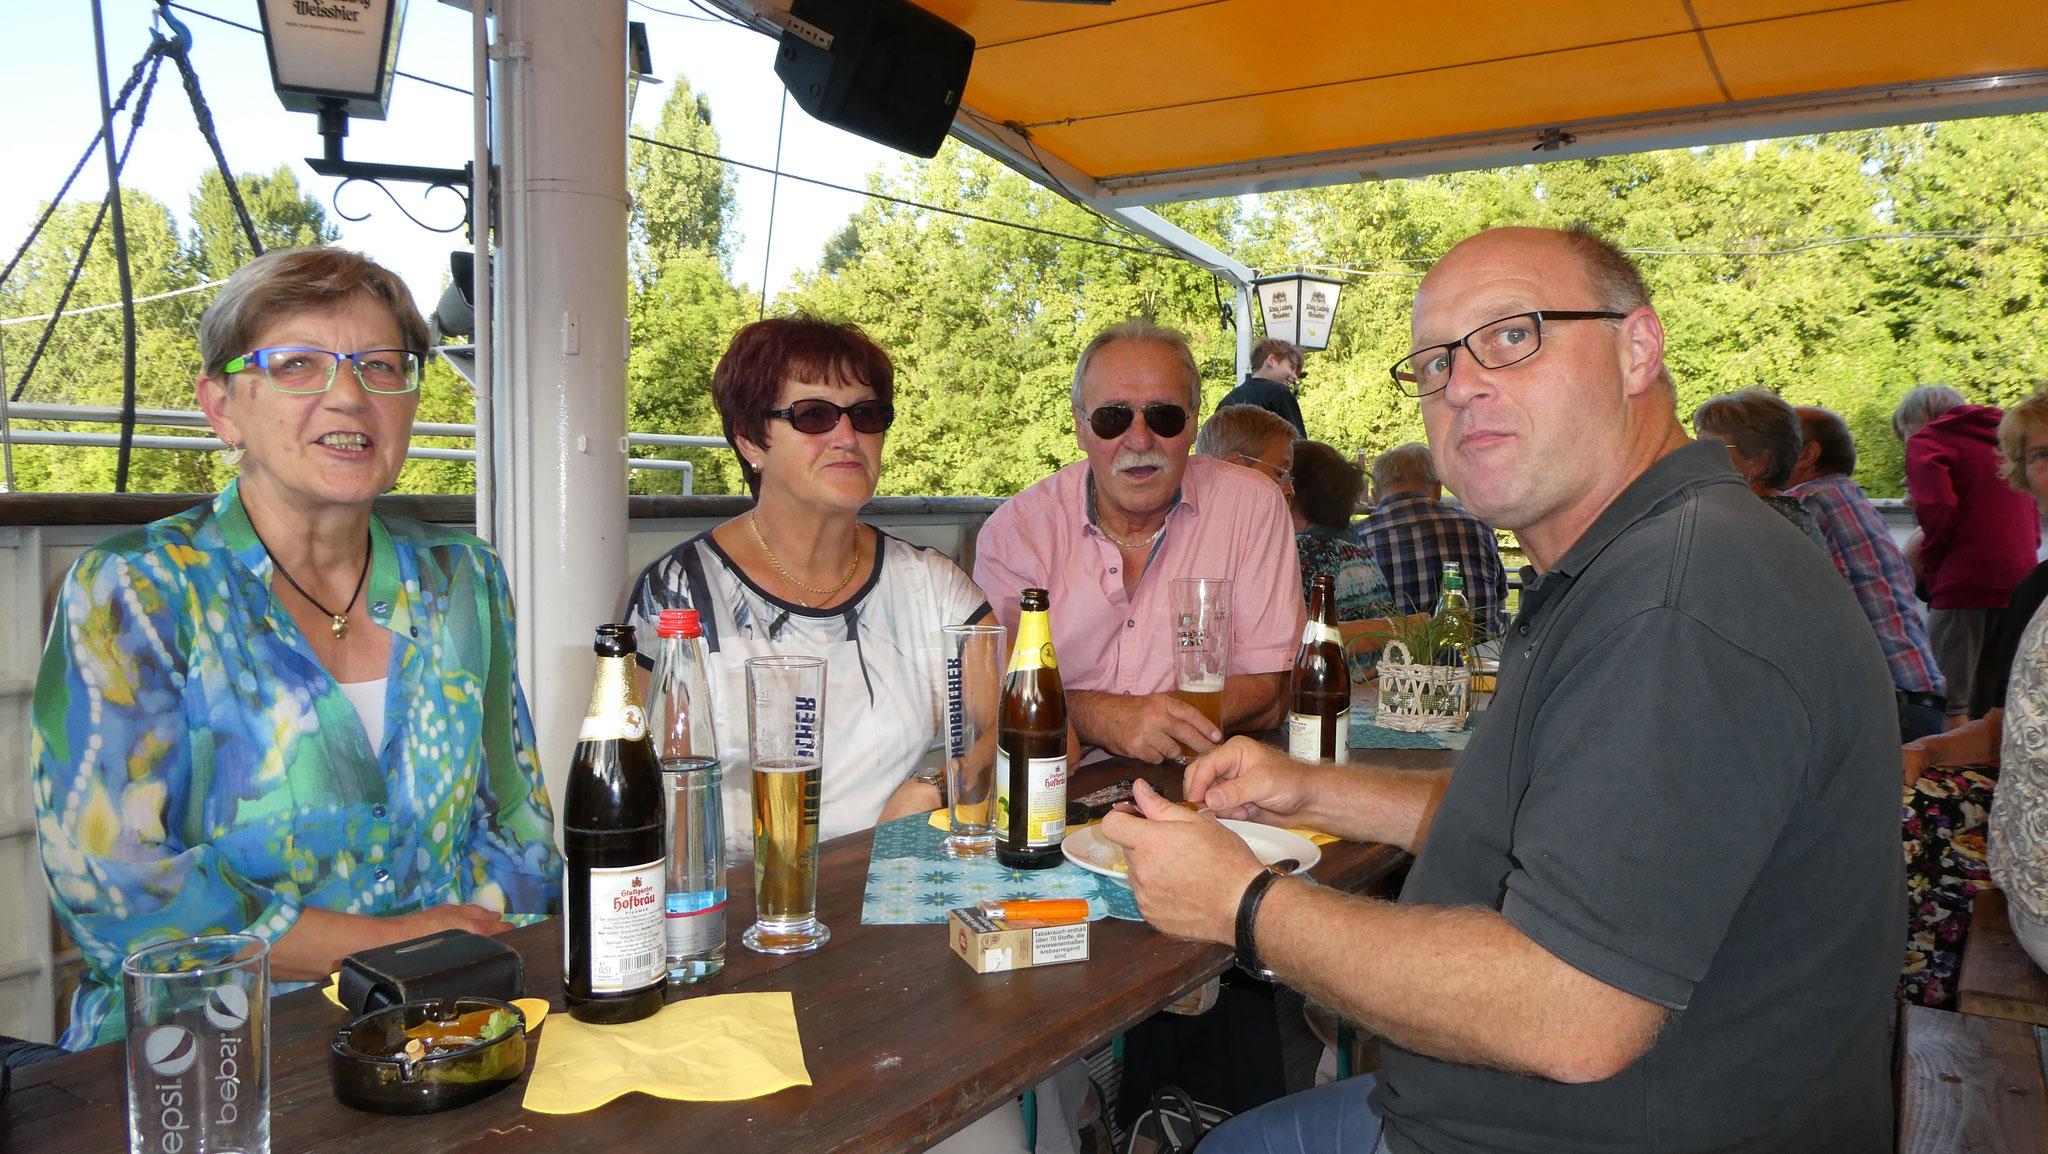 Tafelteam schnuppert Neckarluft - Ausflug am 10.08.2018